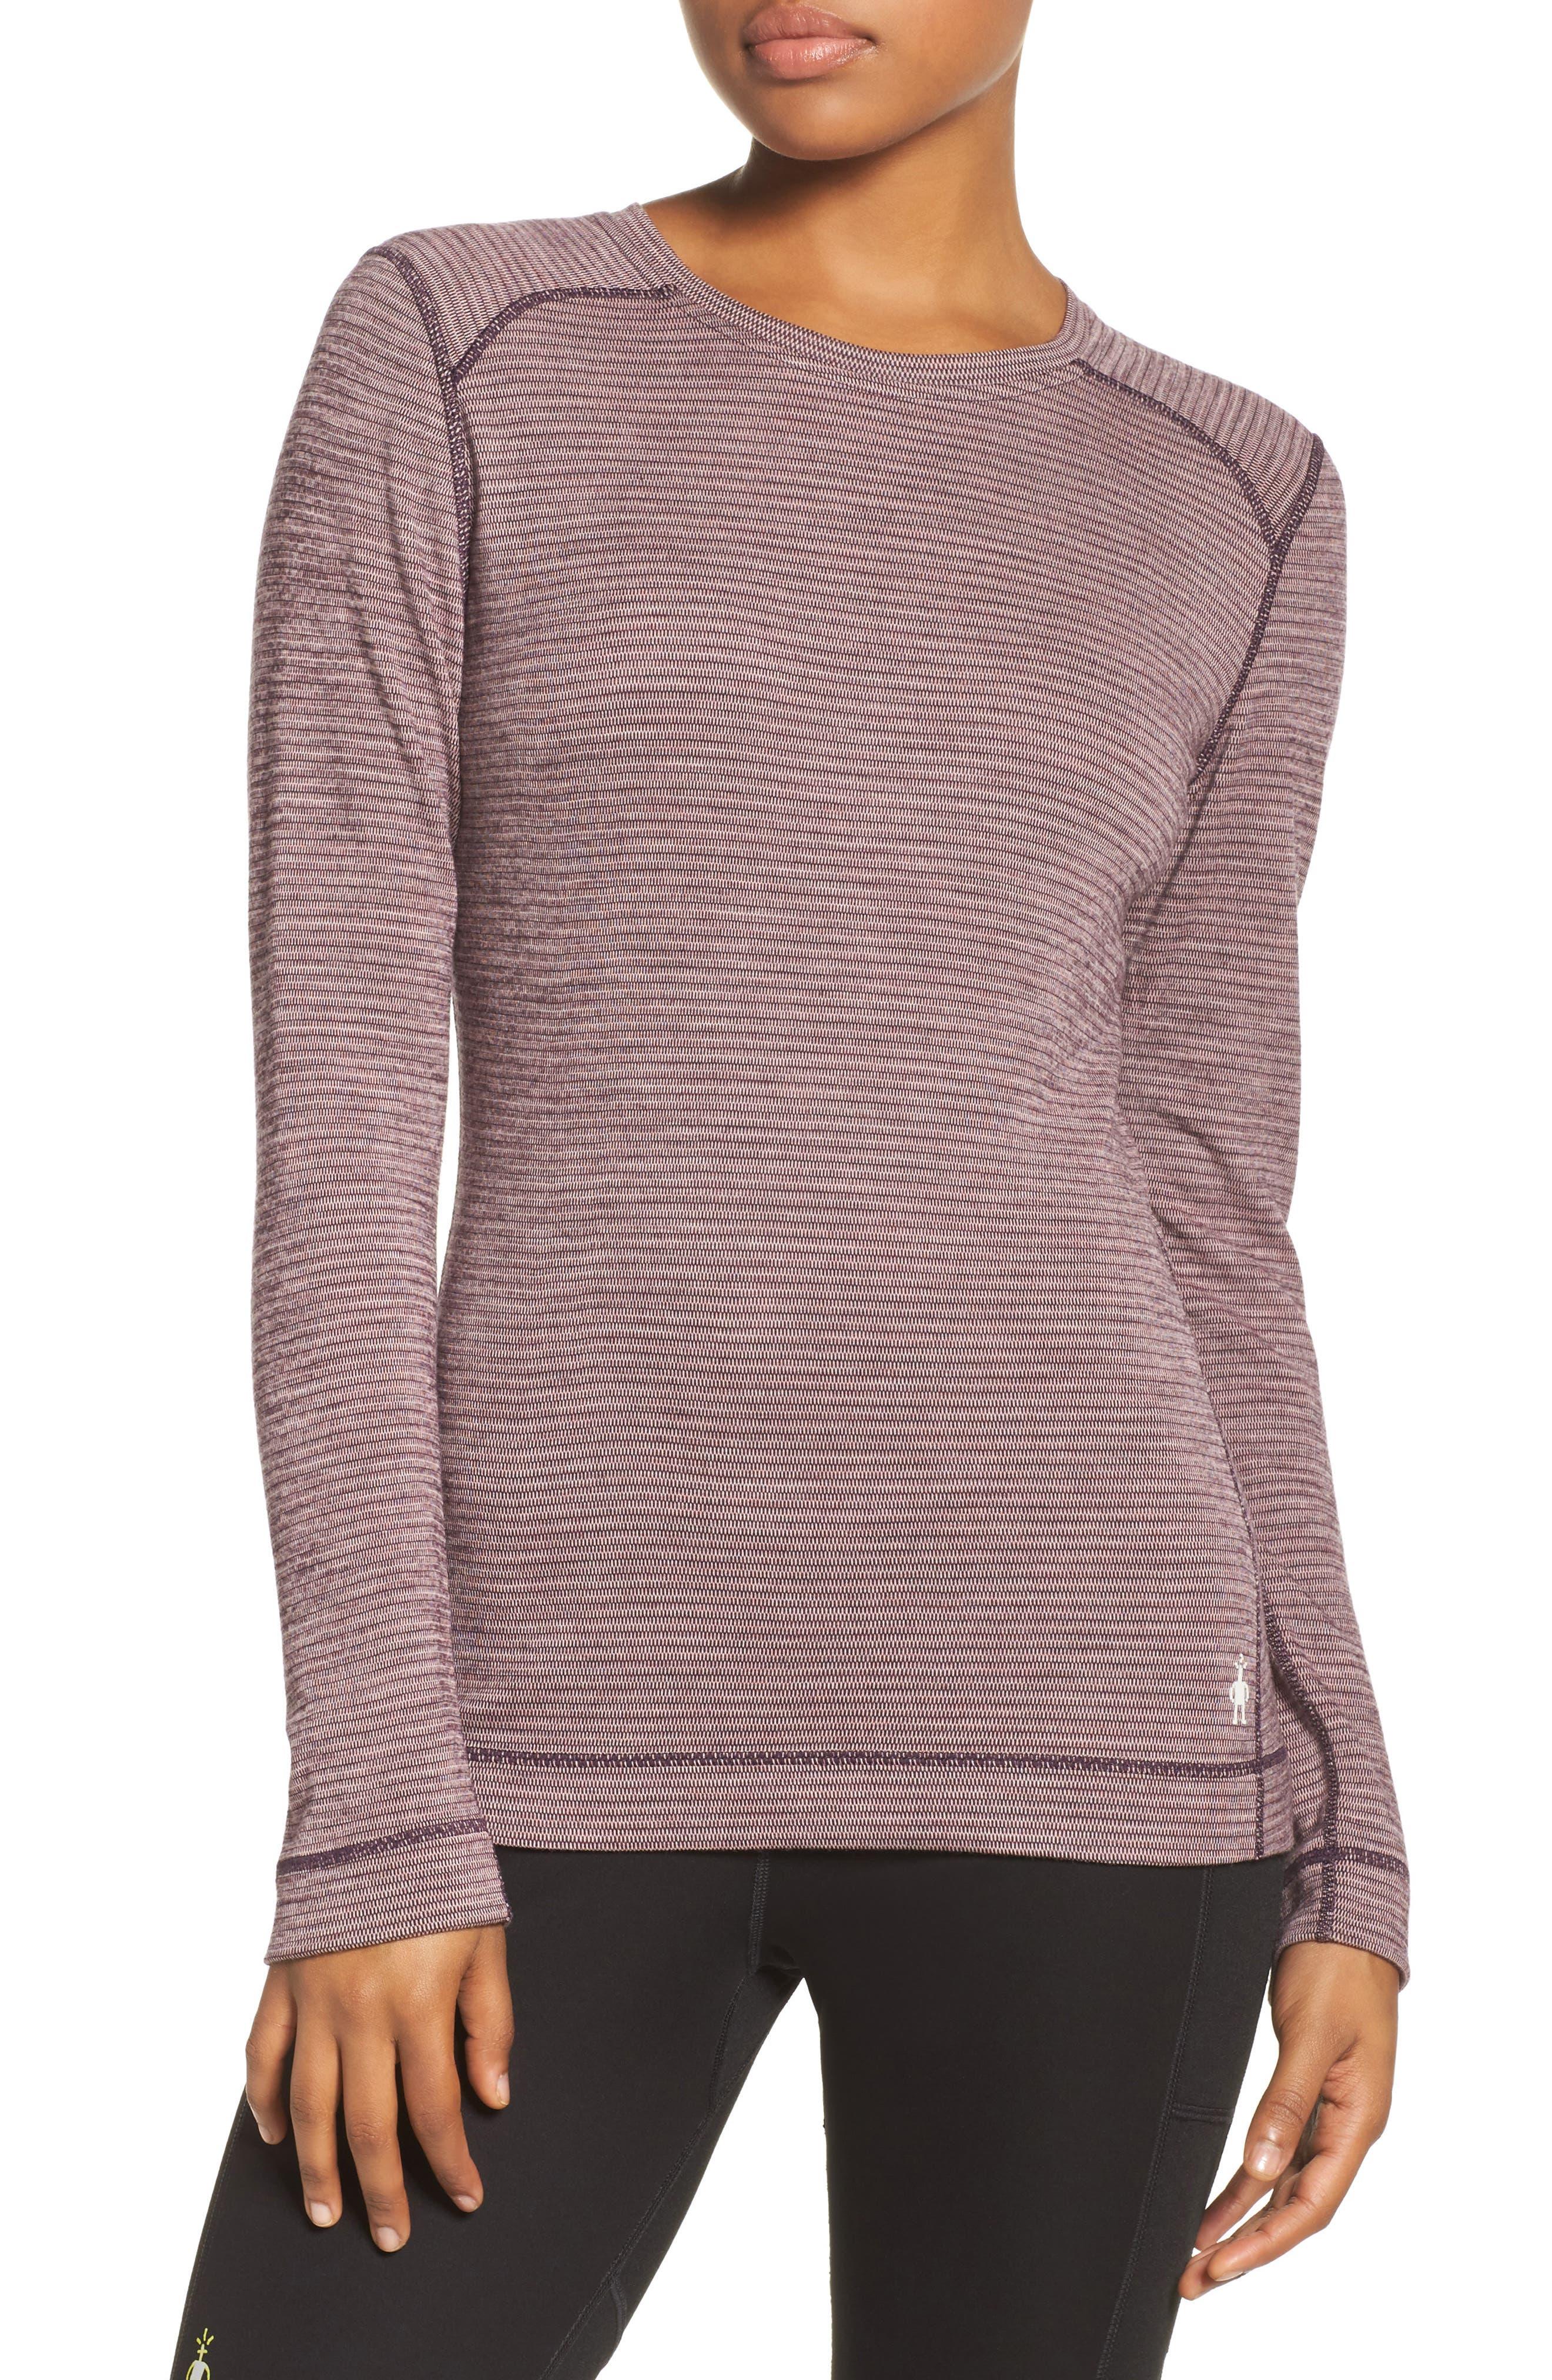 Merino Wool 250 Base Layer Top,                             Main thumbnail 1, color,                             Bordeaux